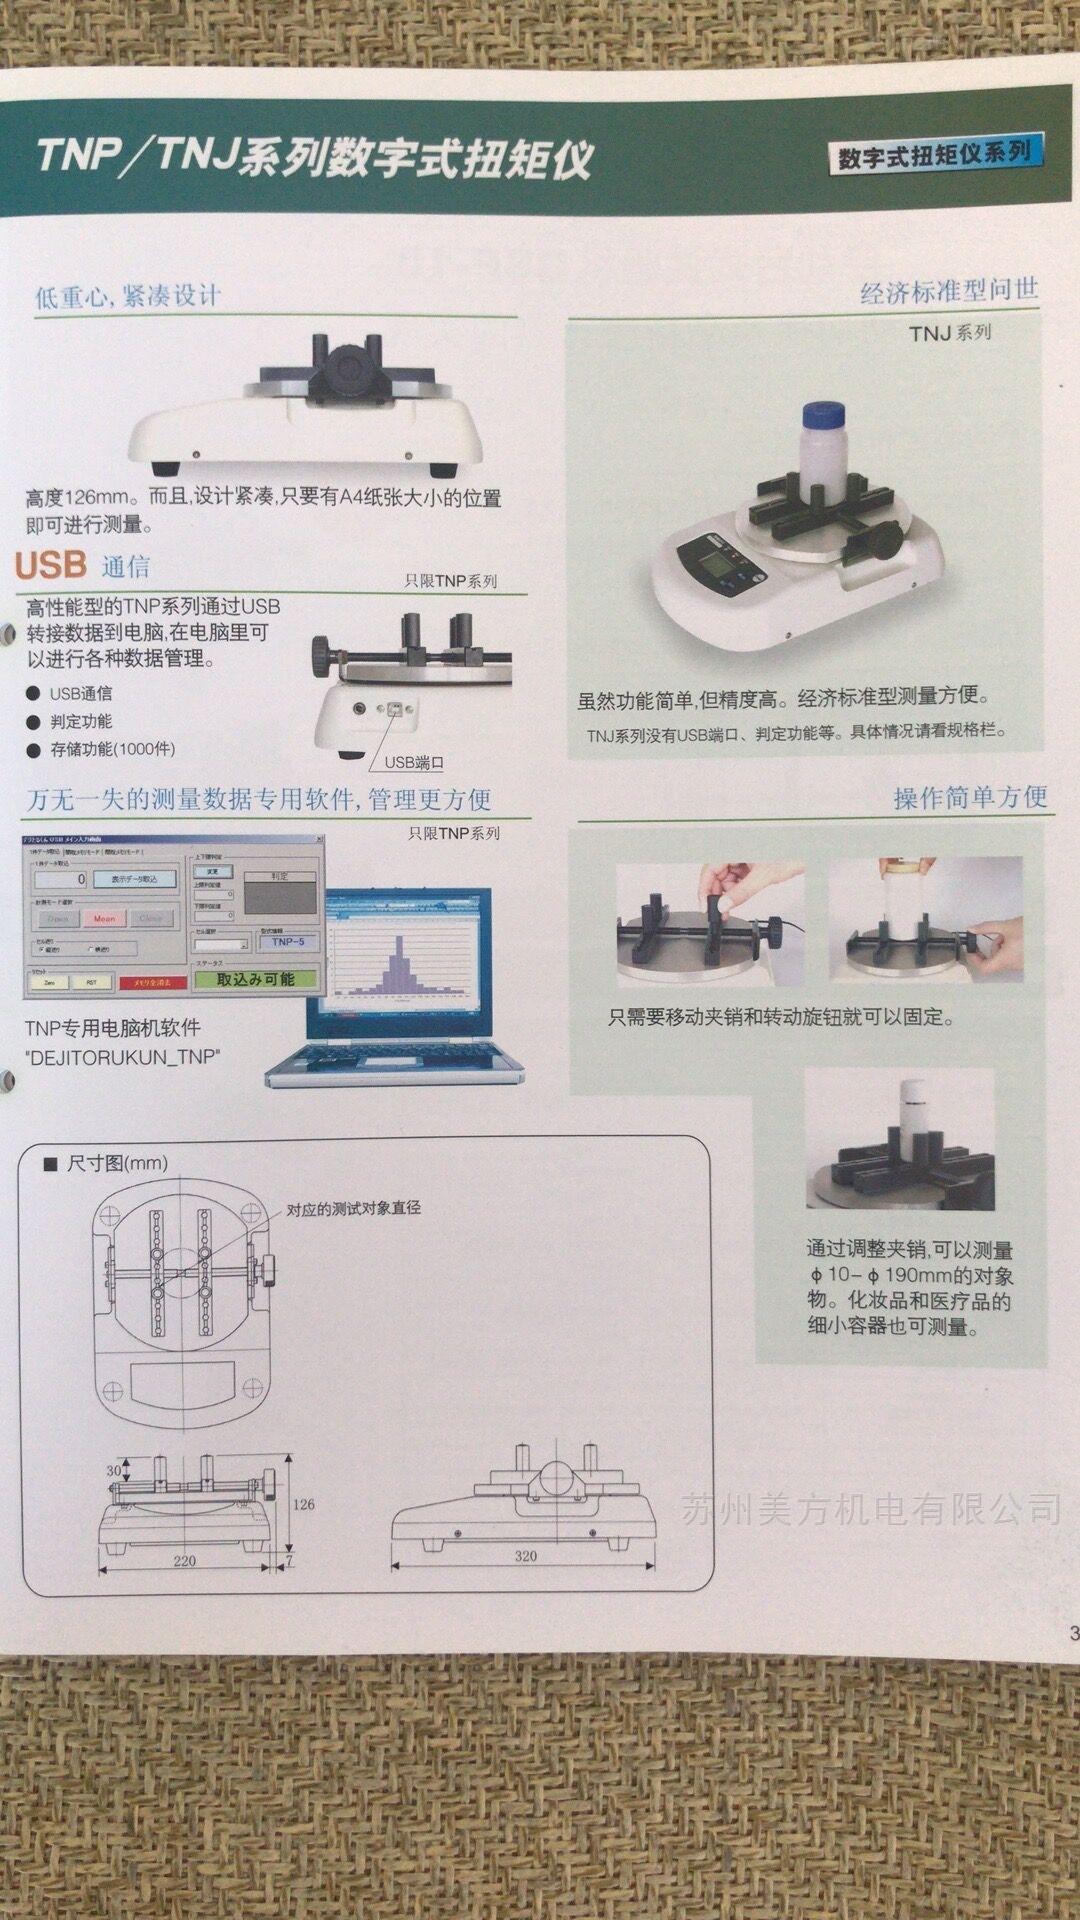 TNJ-2日本力新宝数字式扭矩仪TNJ-2 苏州店